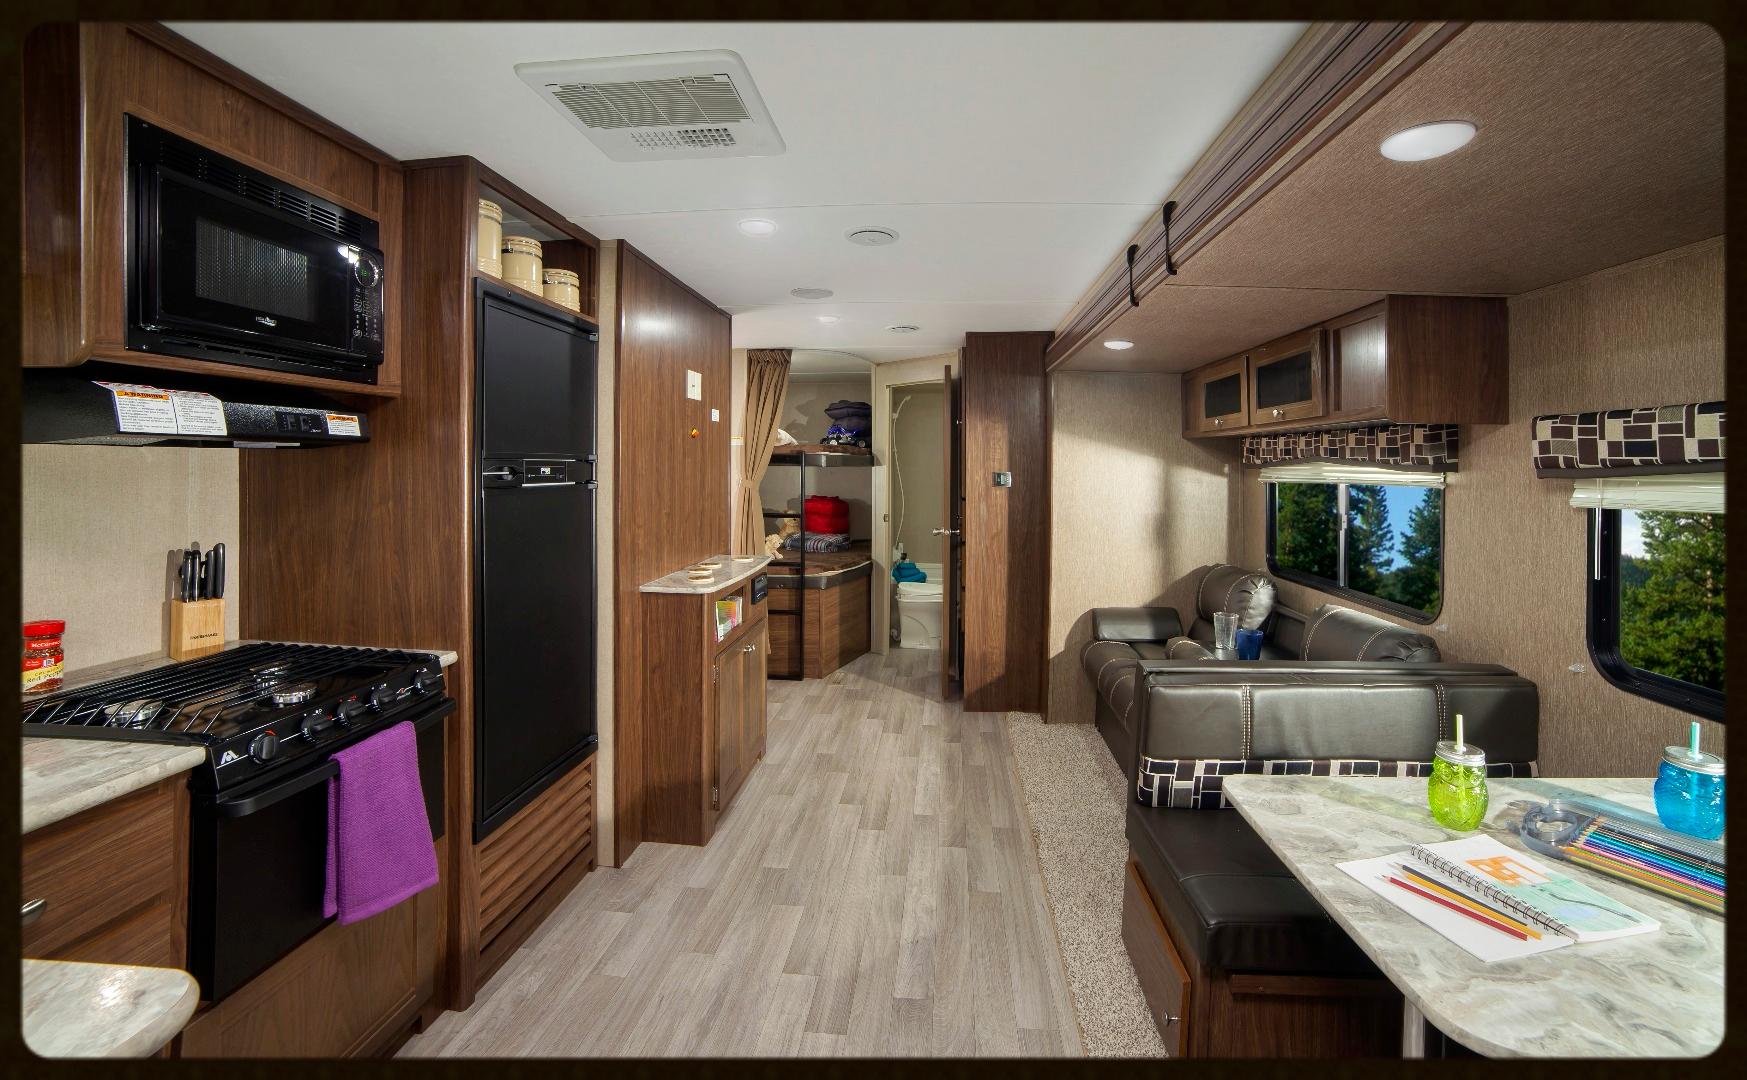 Coleman 285Bh interior